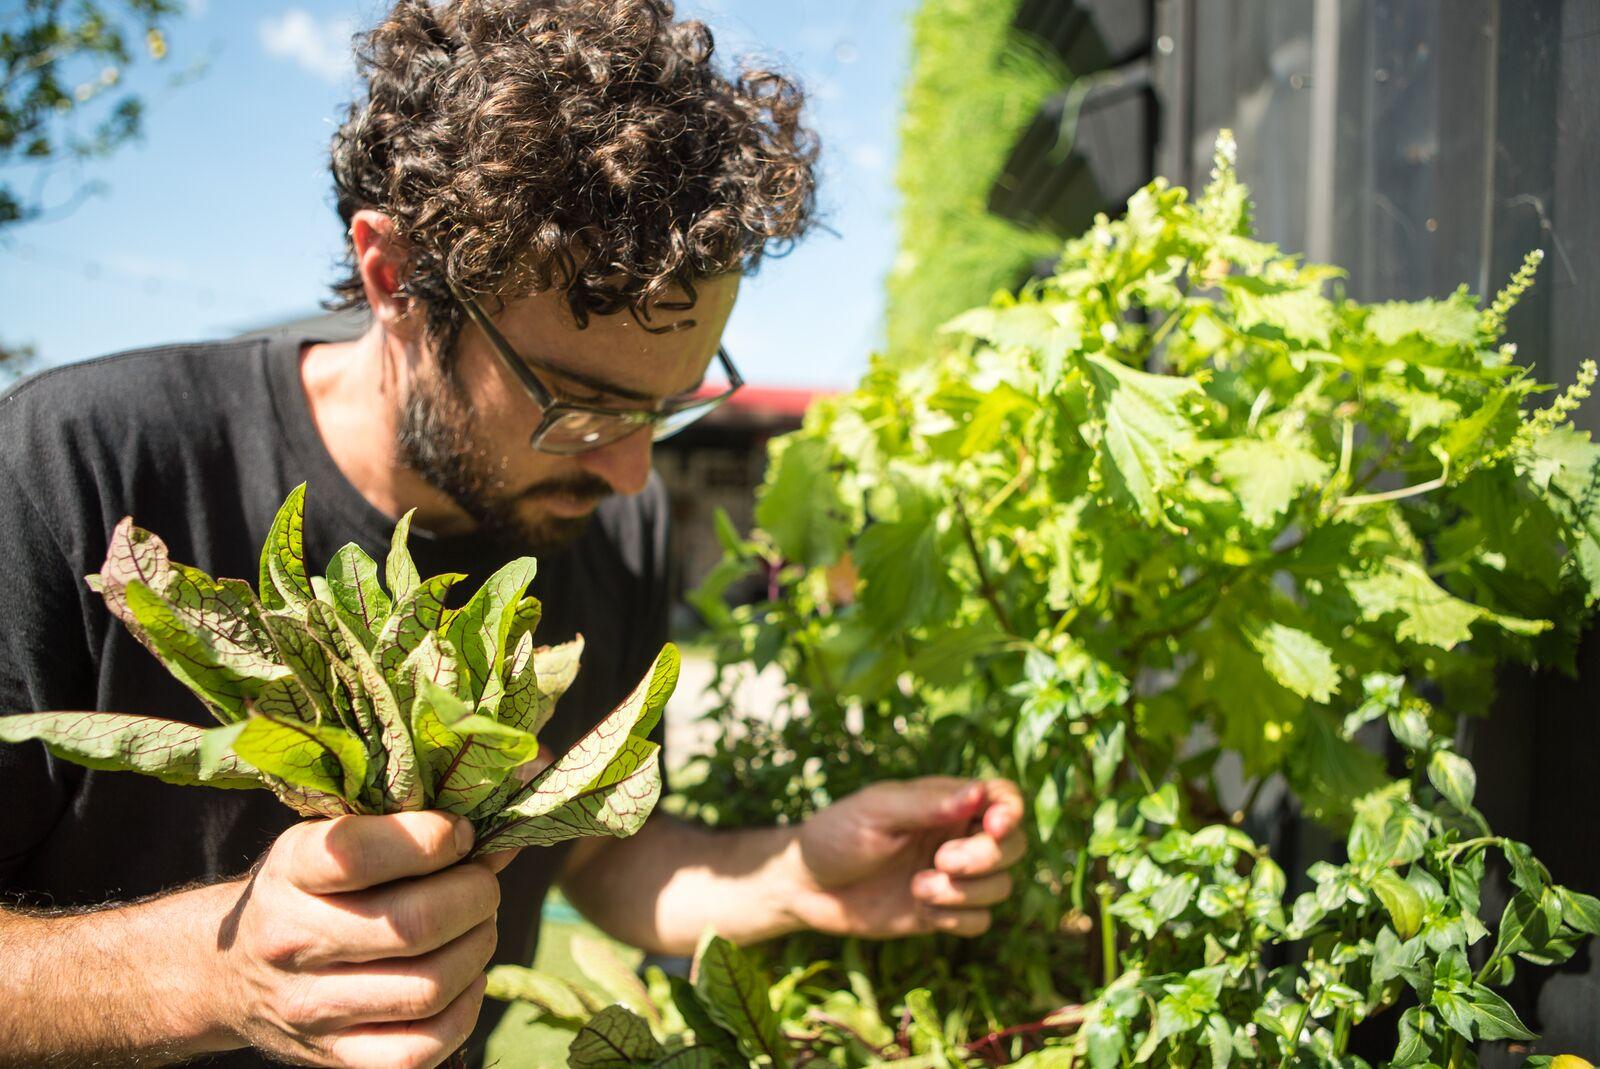 10 golden rules of the summer veggie patch :: gourmet traveller